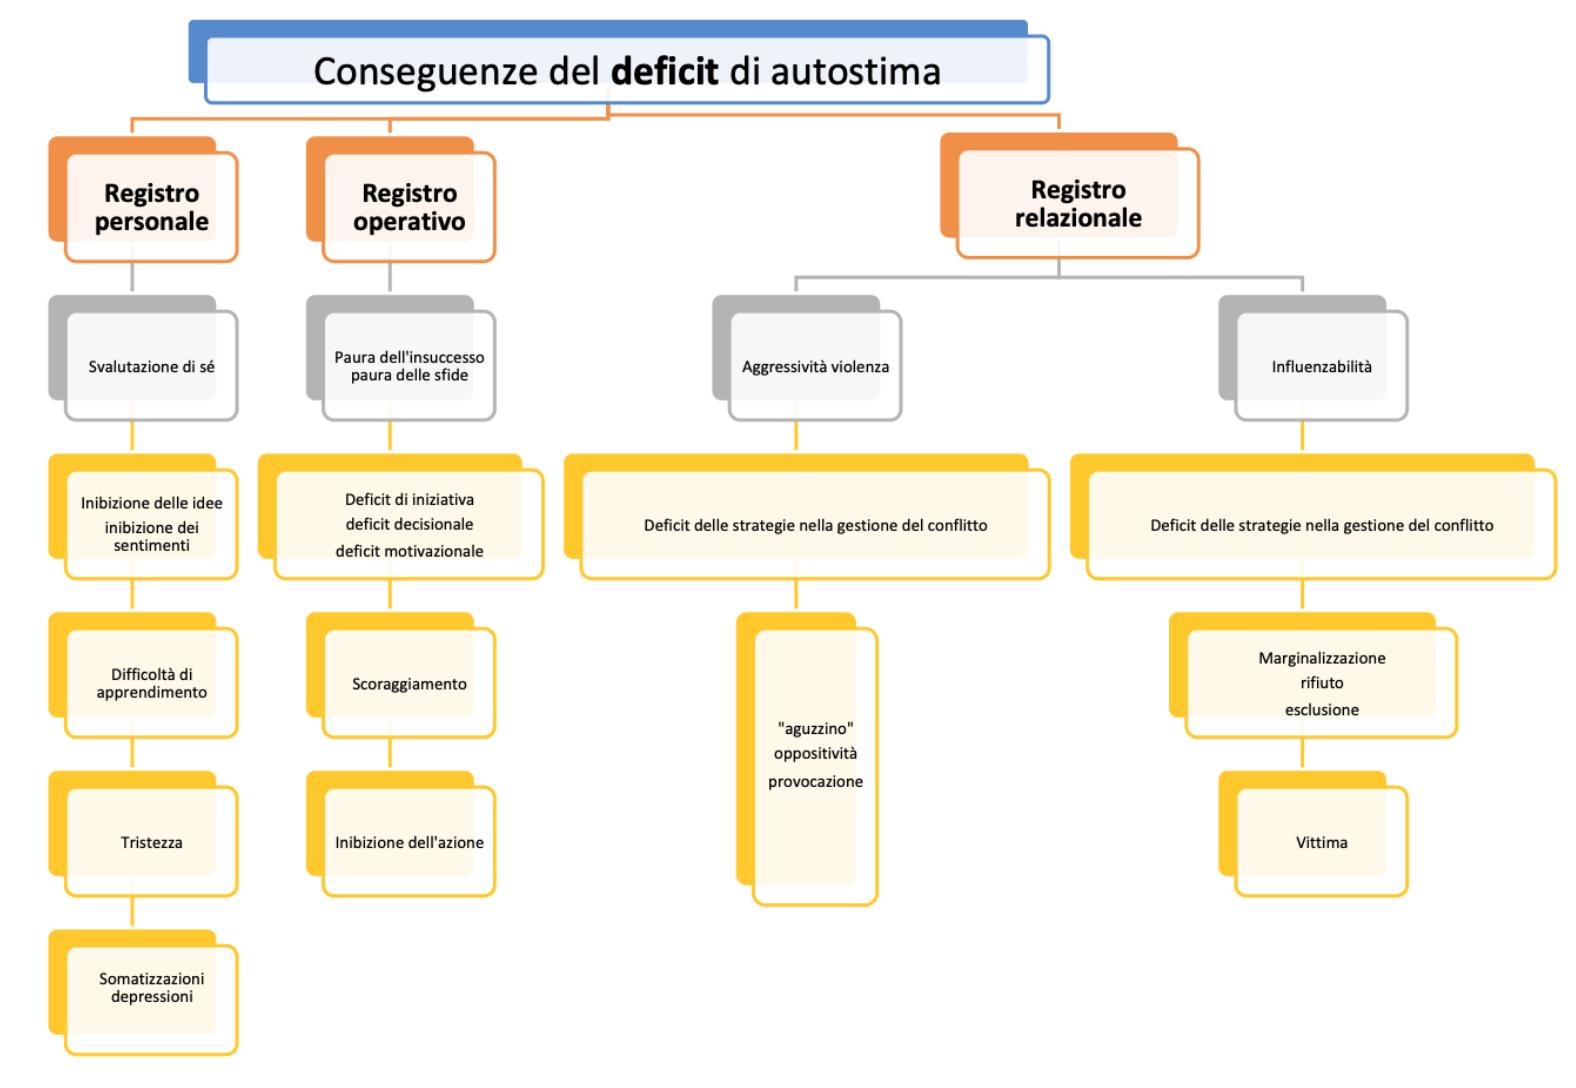 Autostima: conseguenze del deficit